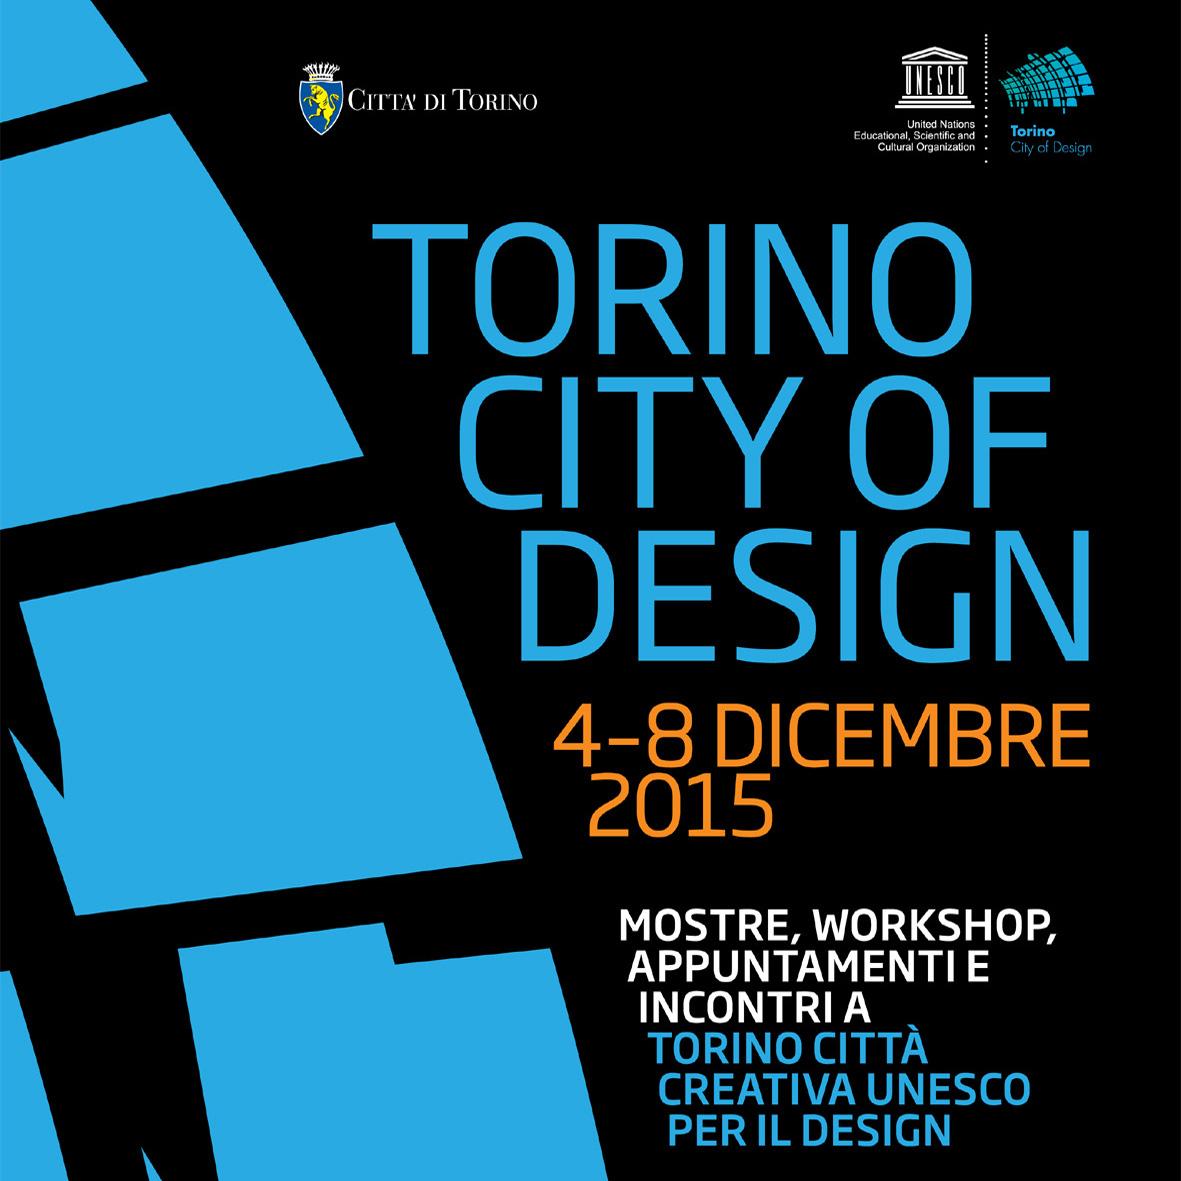 torino_city_of_design